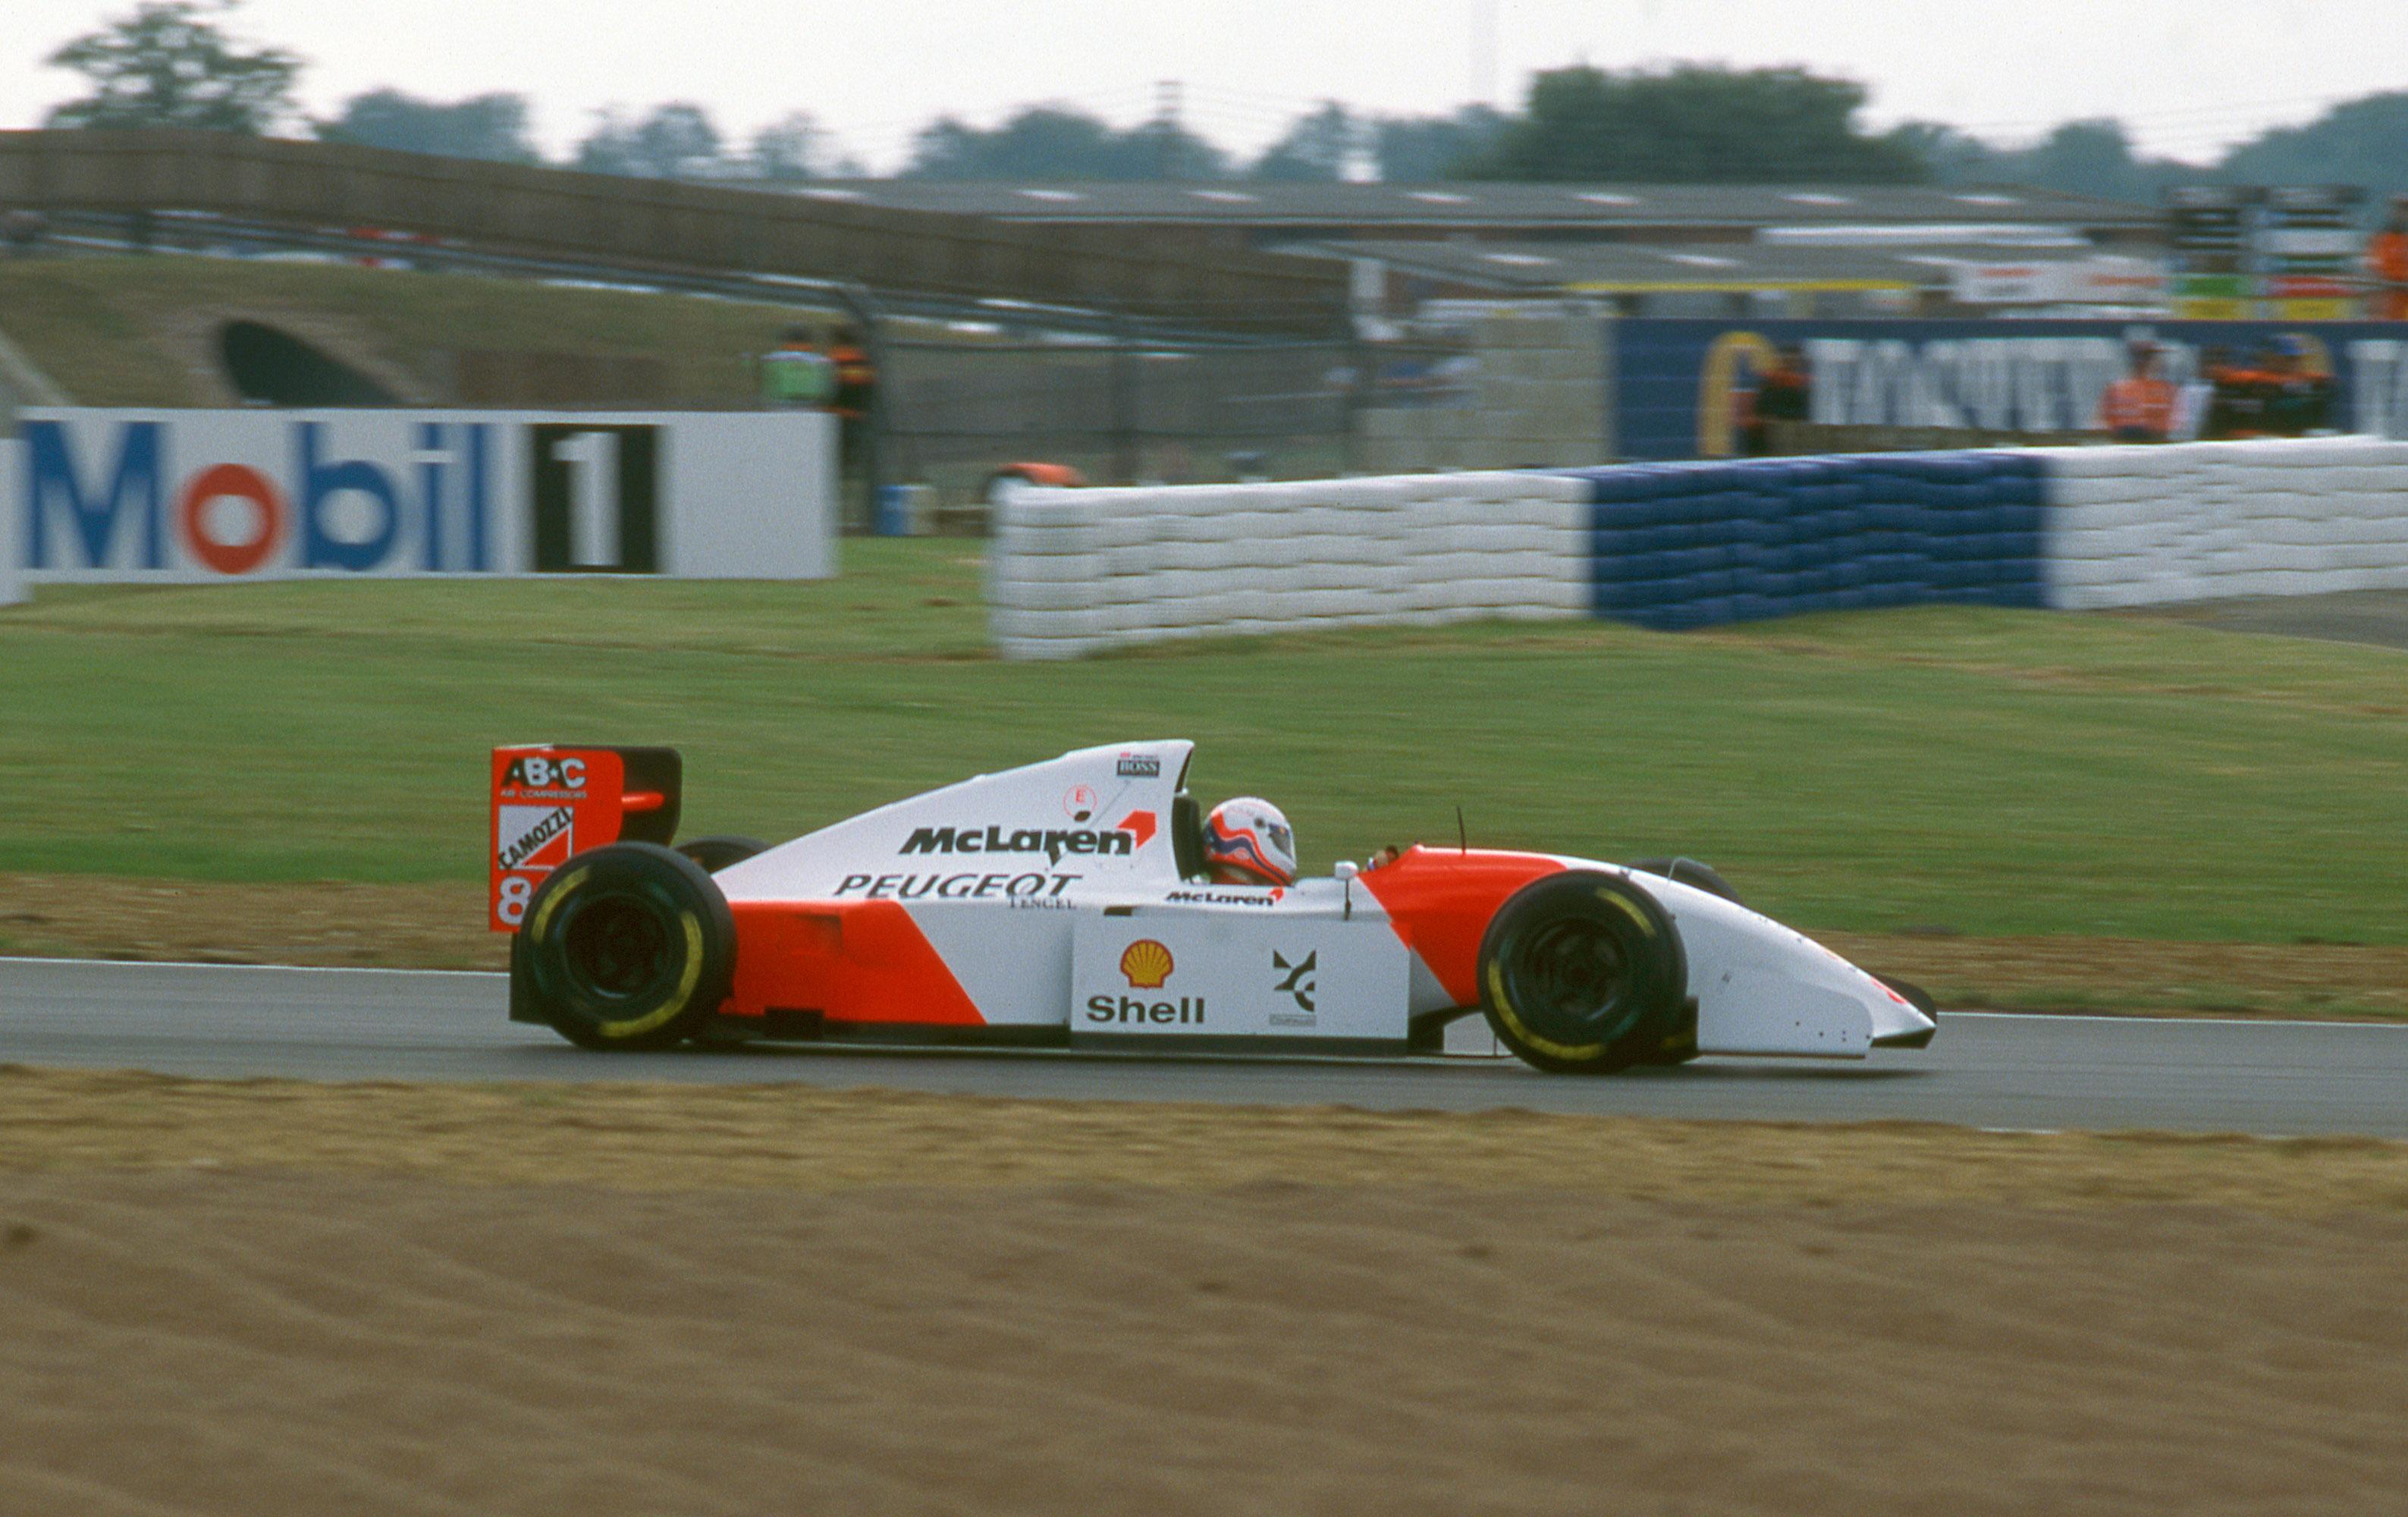 McLaren Peugeot MP4/9 1994